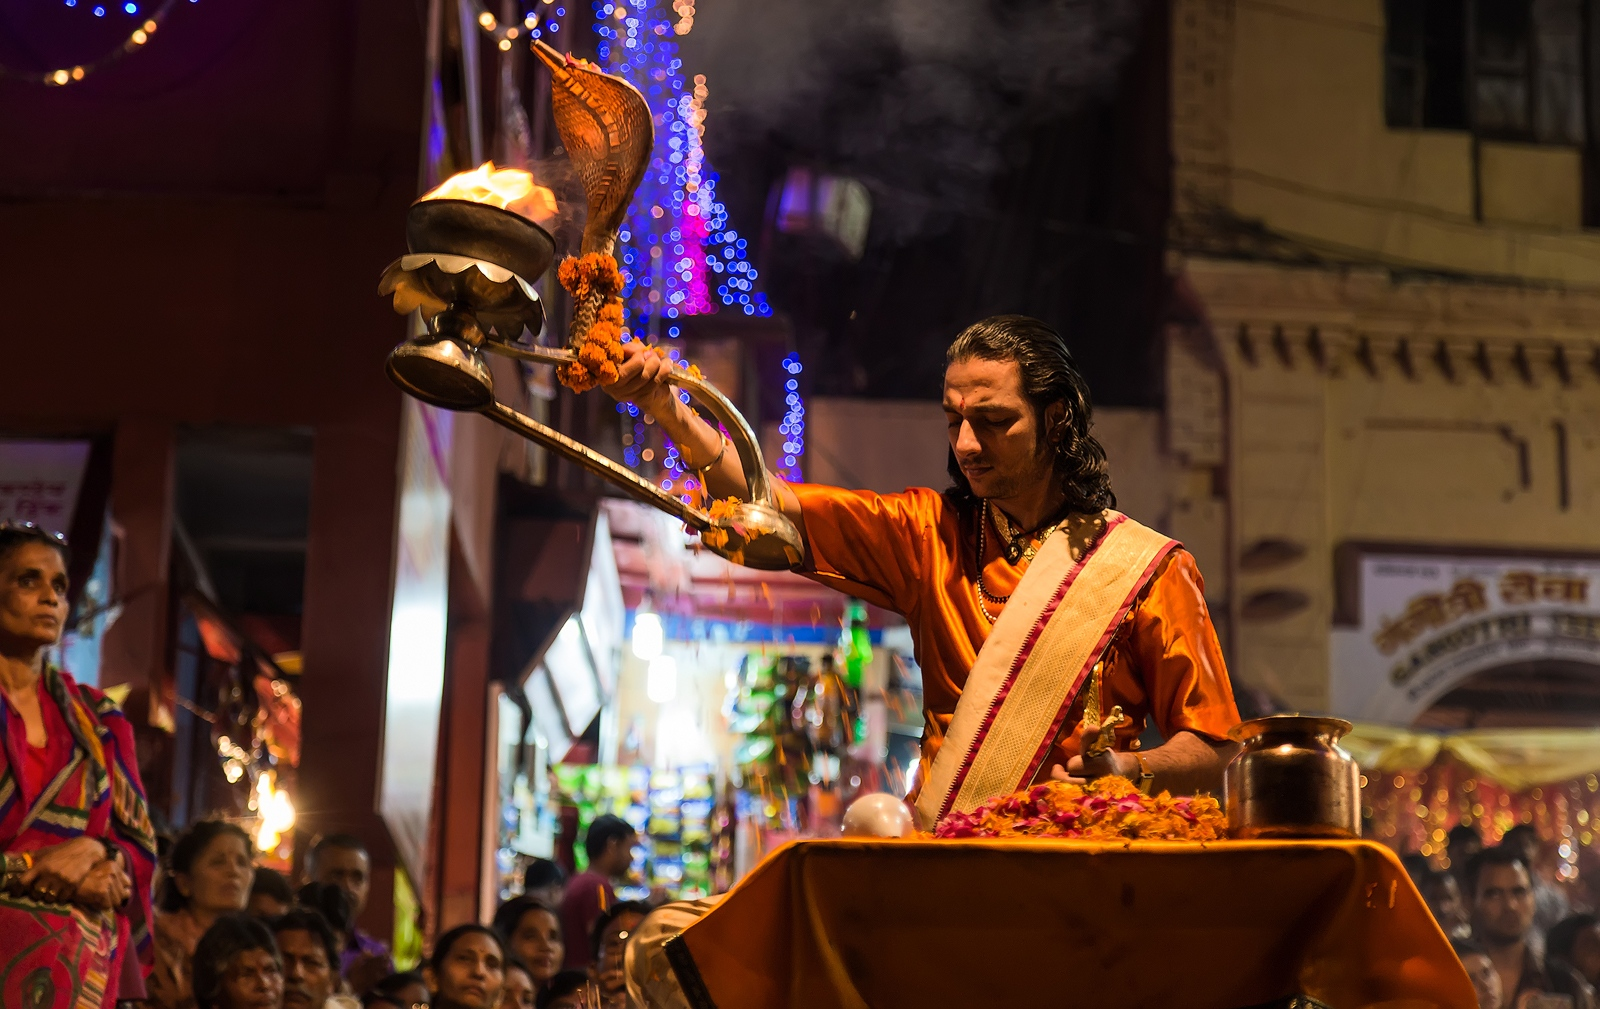 Benares. India